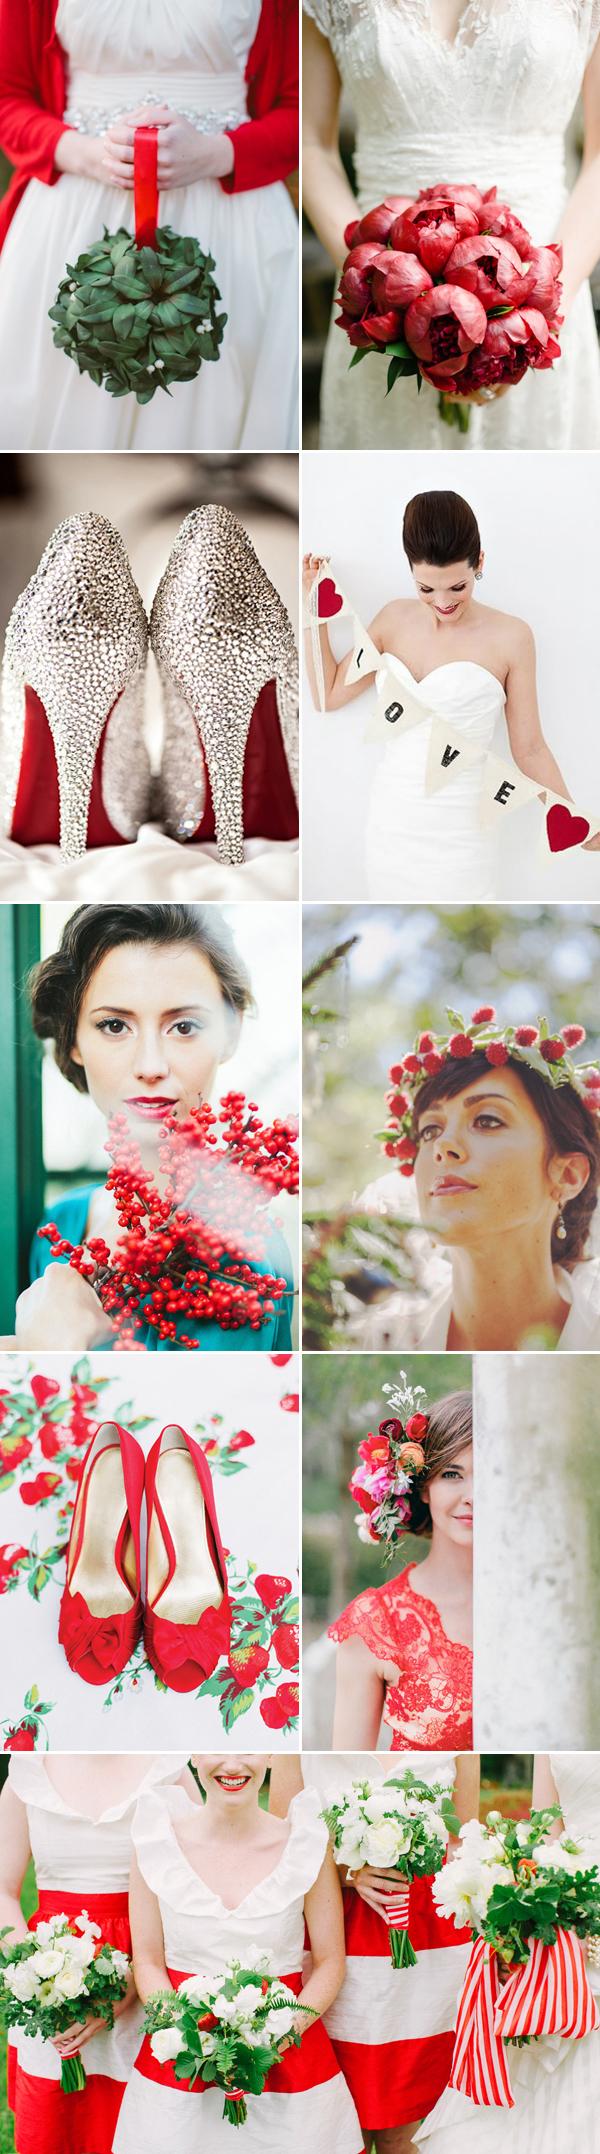 Christmas03-brides